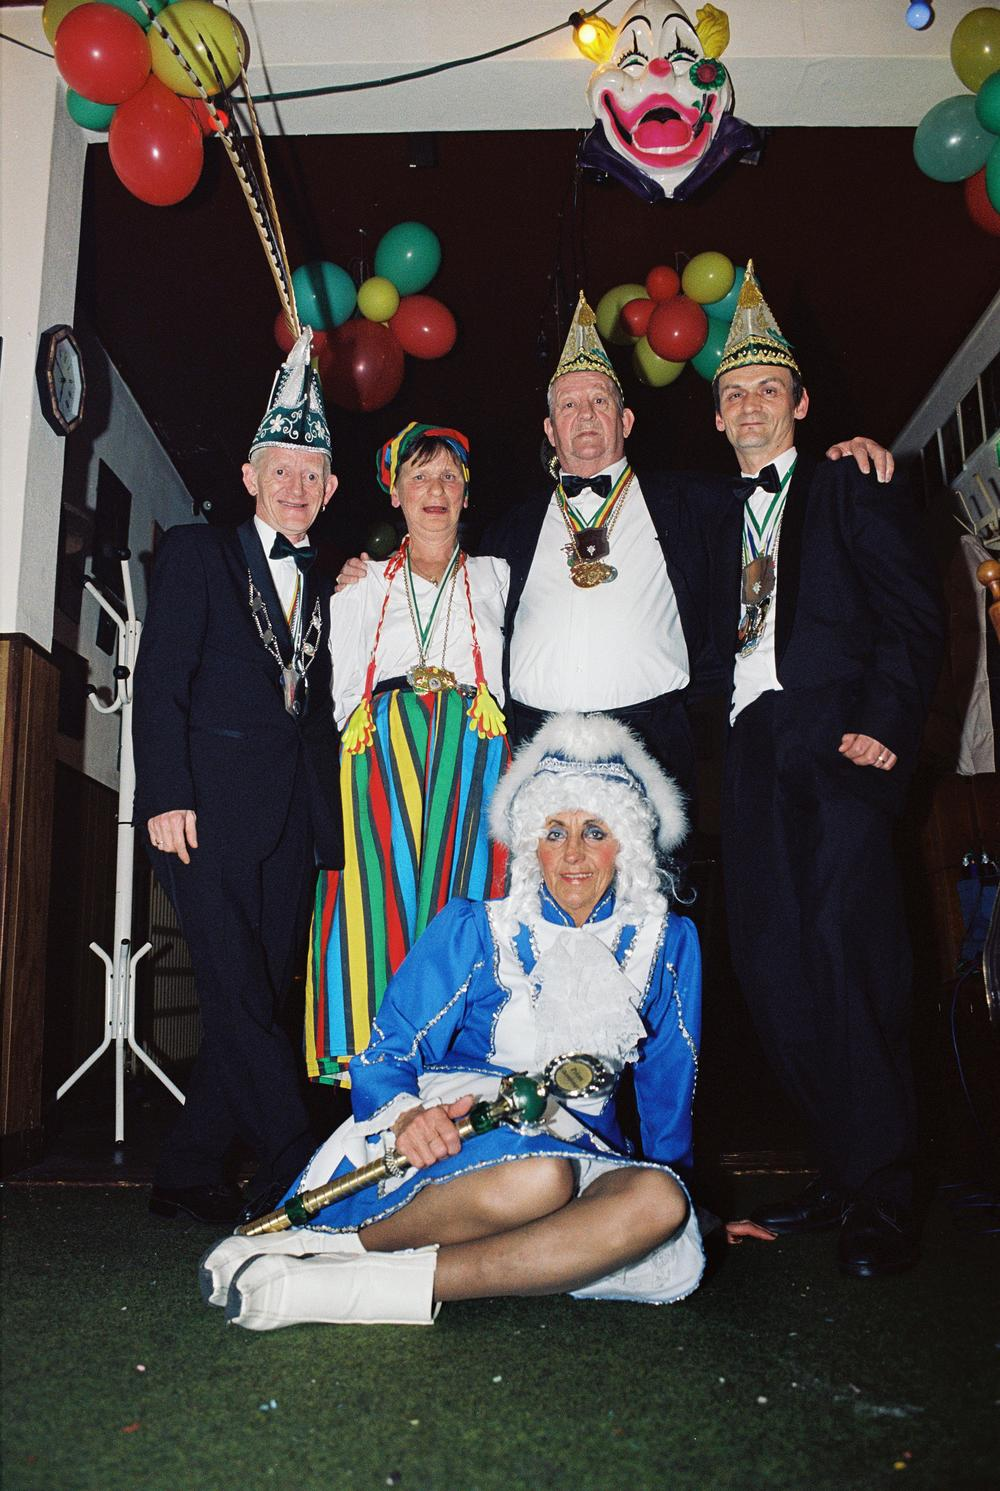 Nootdorp-Lou-en-Tiny-carnaval-2.jpg